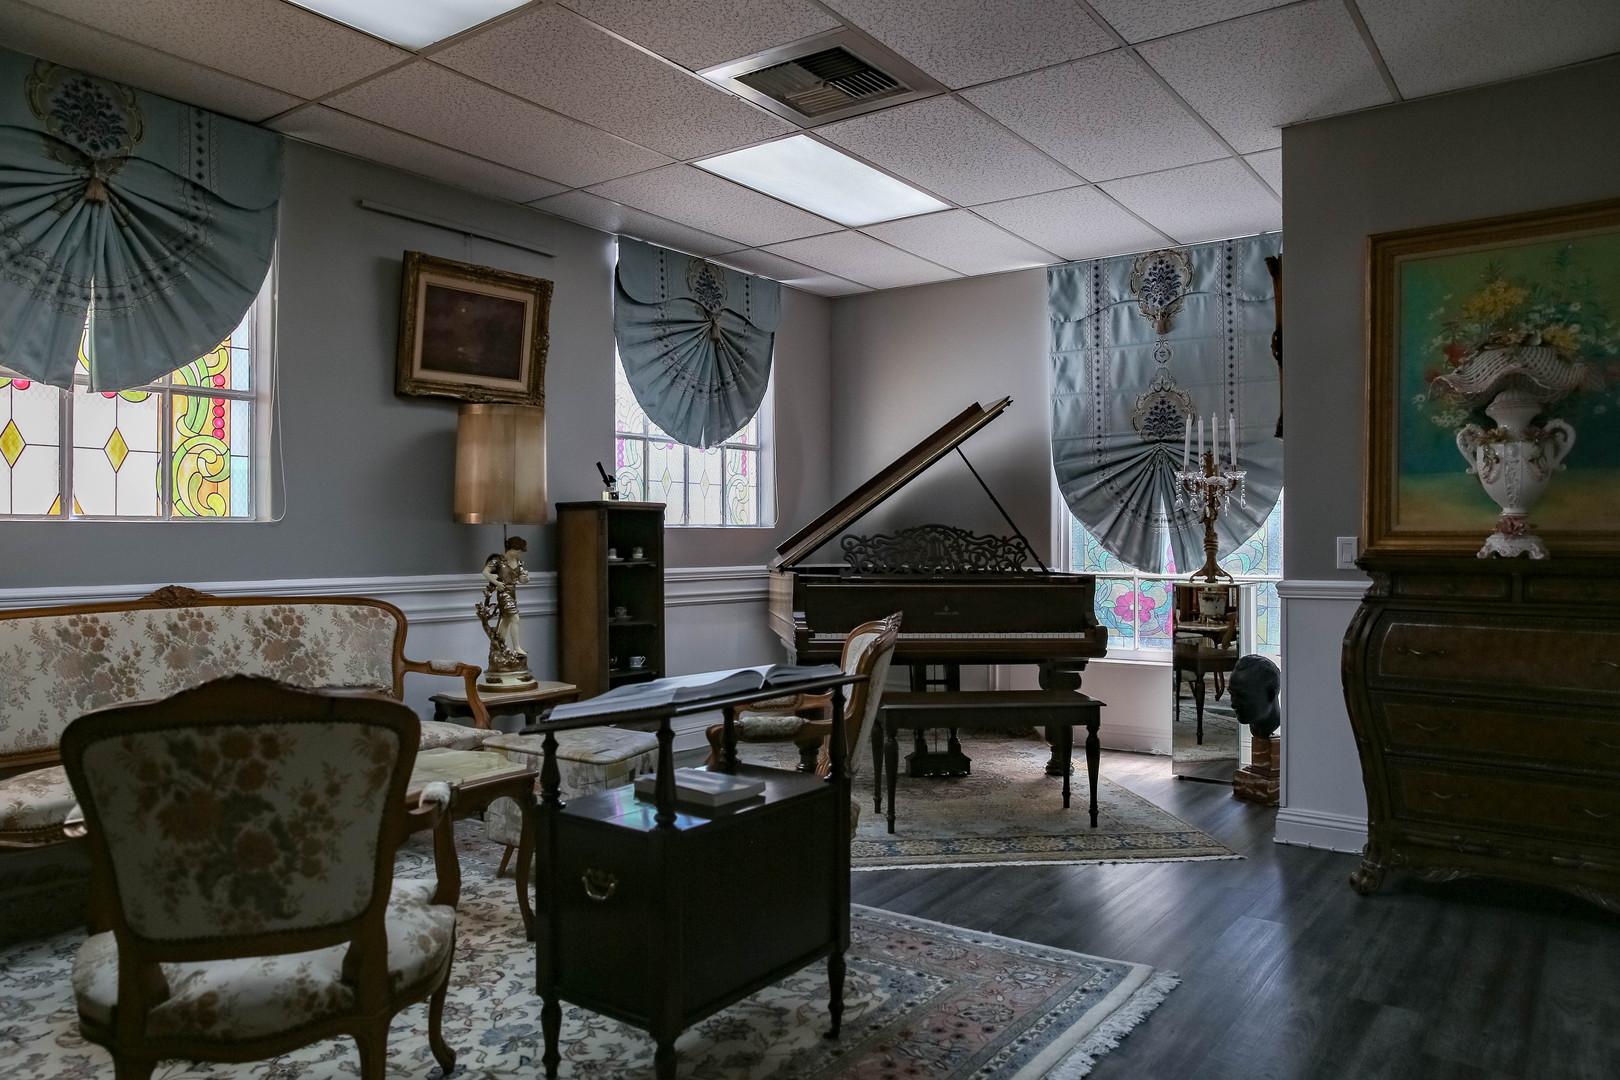 Fine Arts, Antique and Piano Room